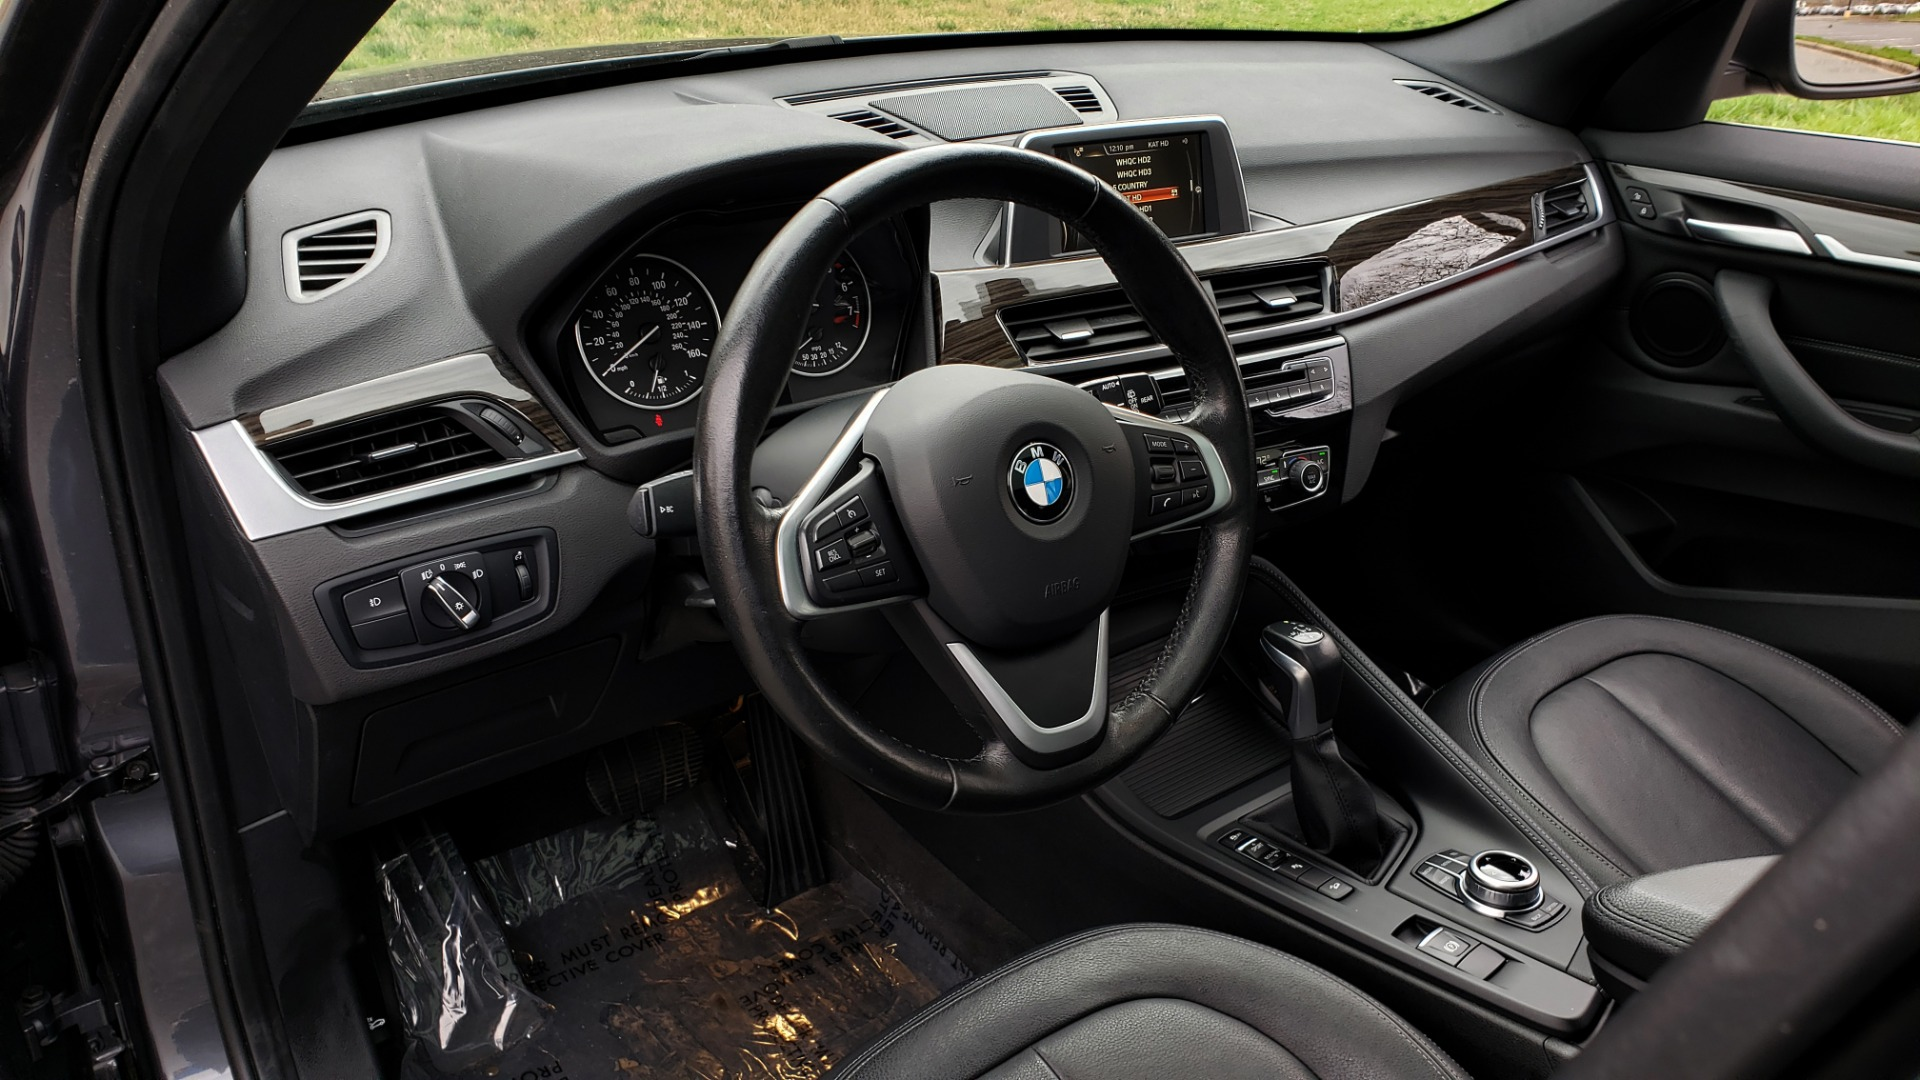 Used 2017 BMW X1 XDRIVE28I / PREM PKG / DRIVER ASST / NAV / CLD WTHR for sale Sold at Formula Imports in Charlotte NC 28227 38